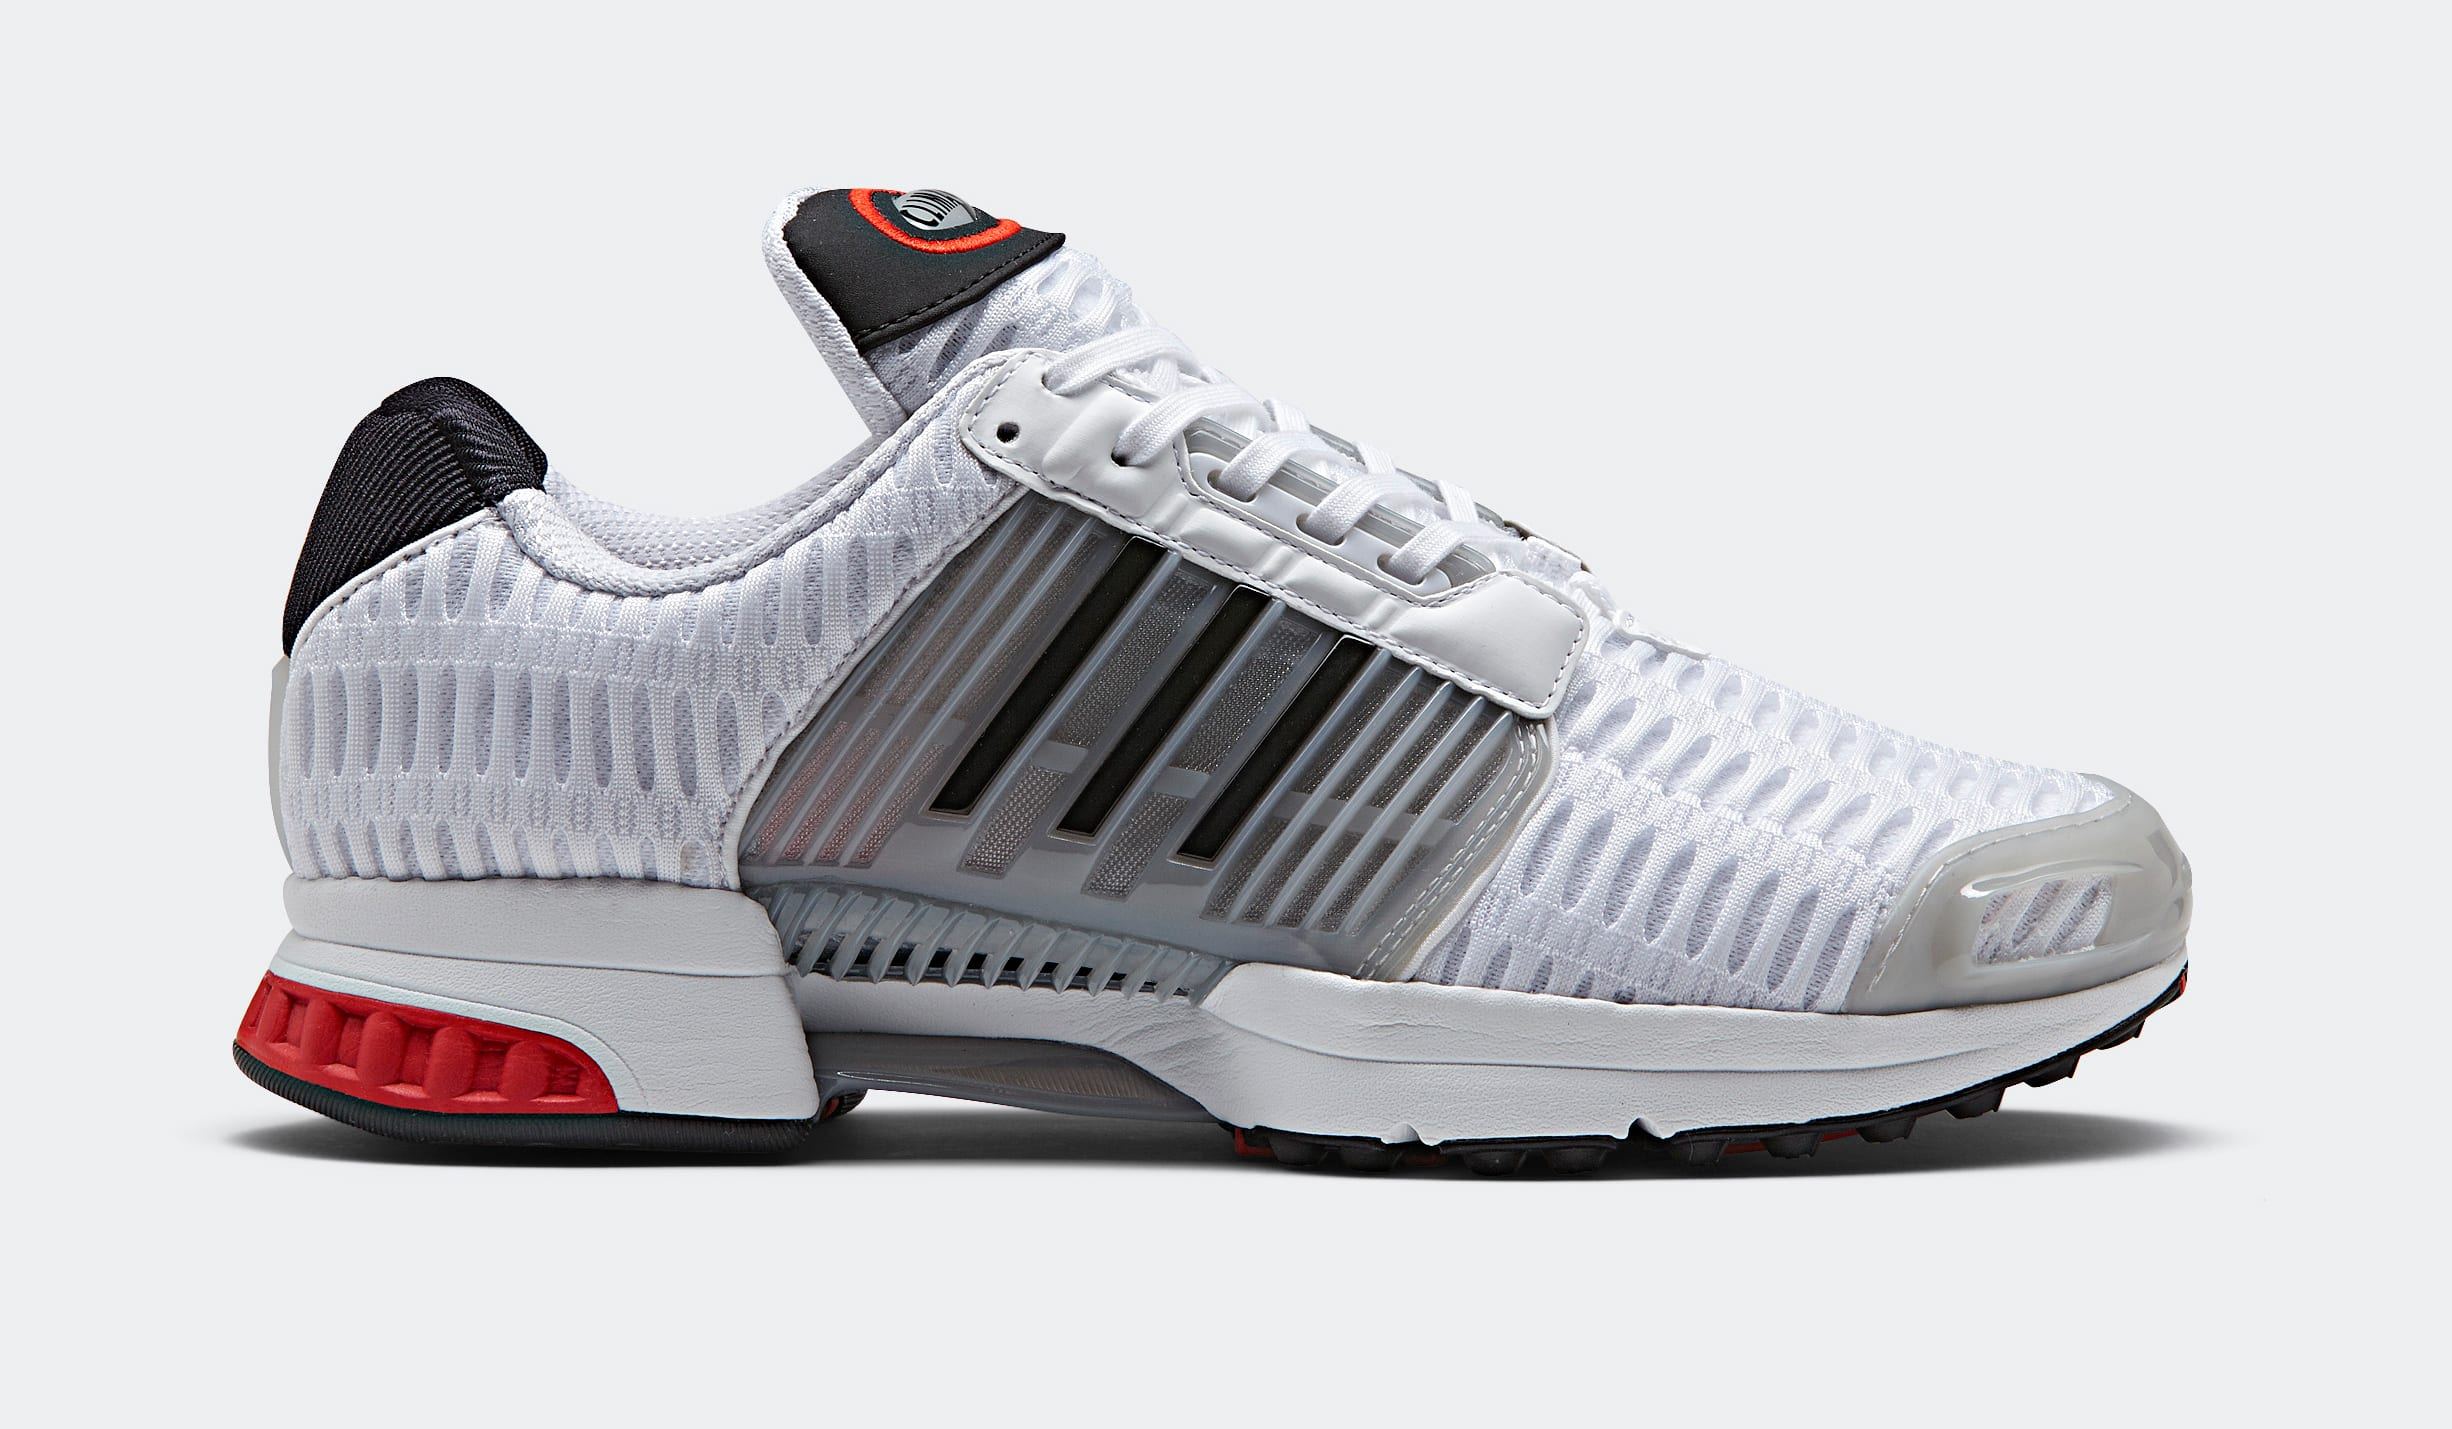 Adidas Climacool OG 2